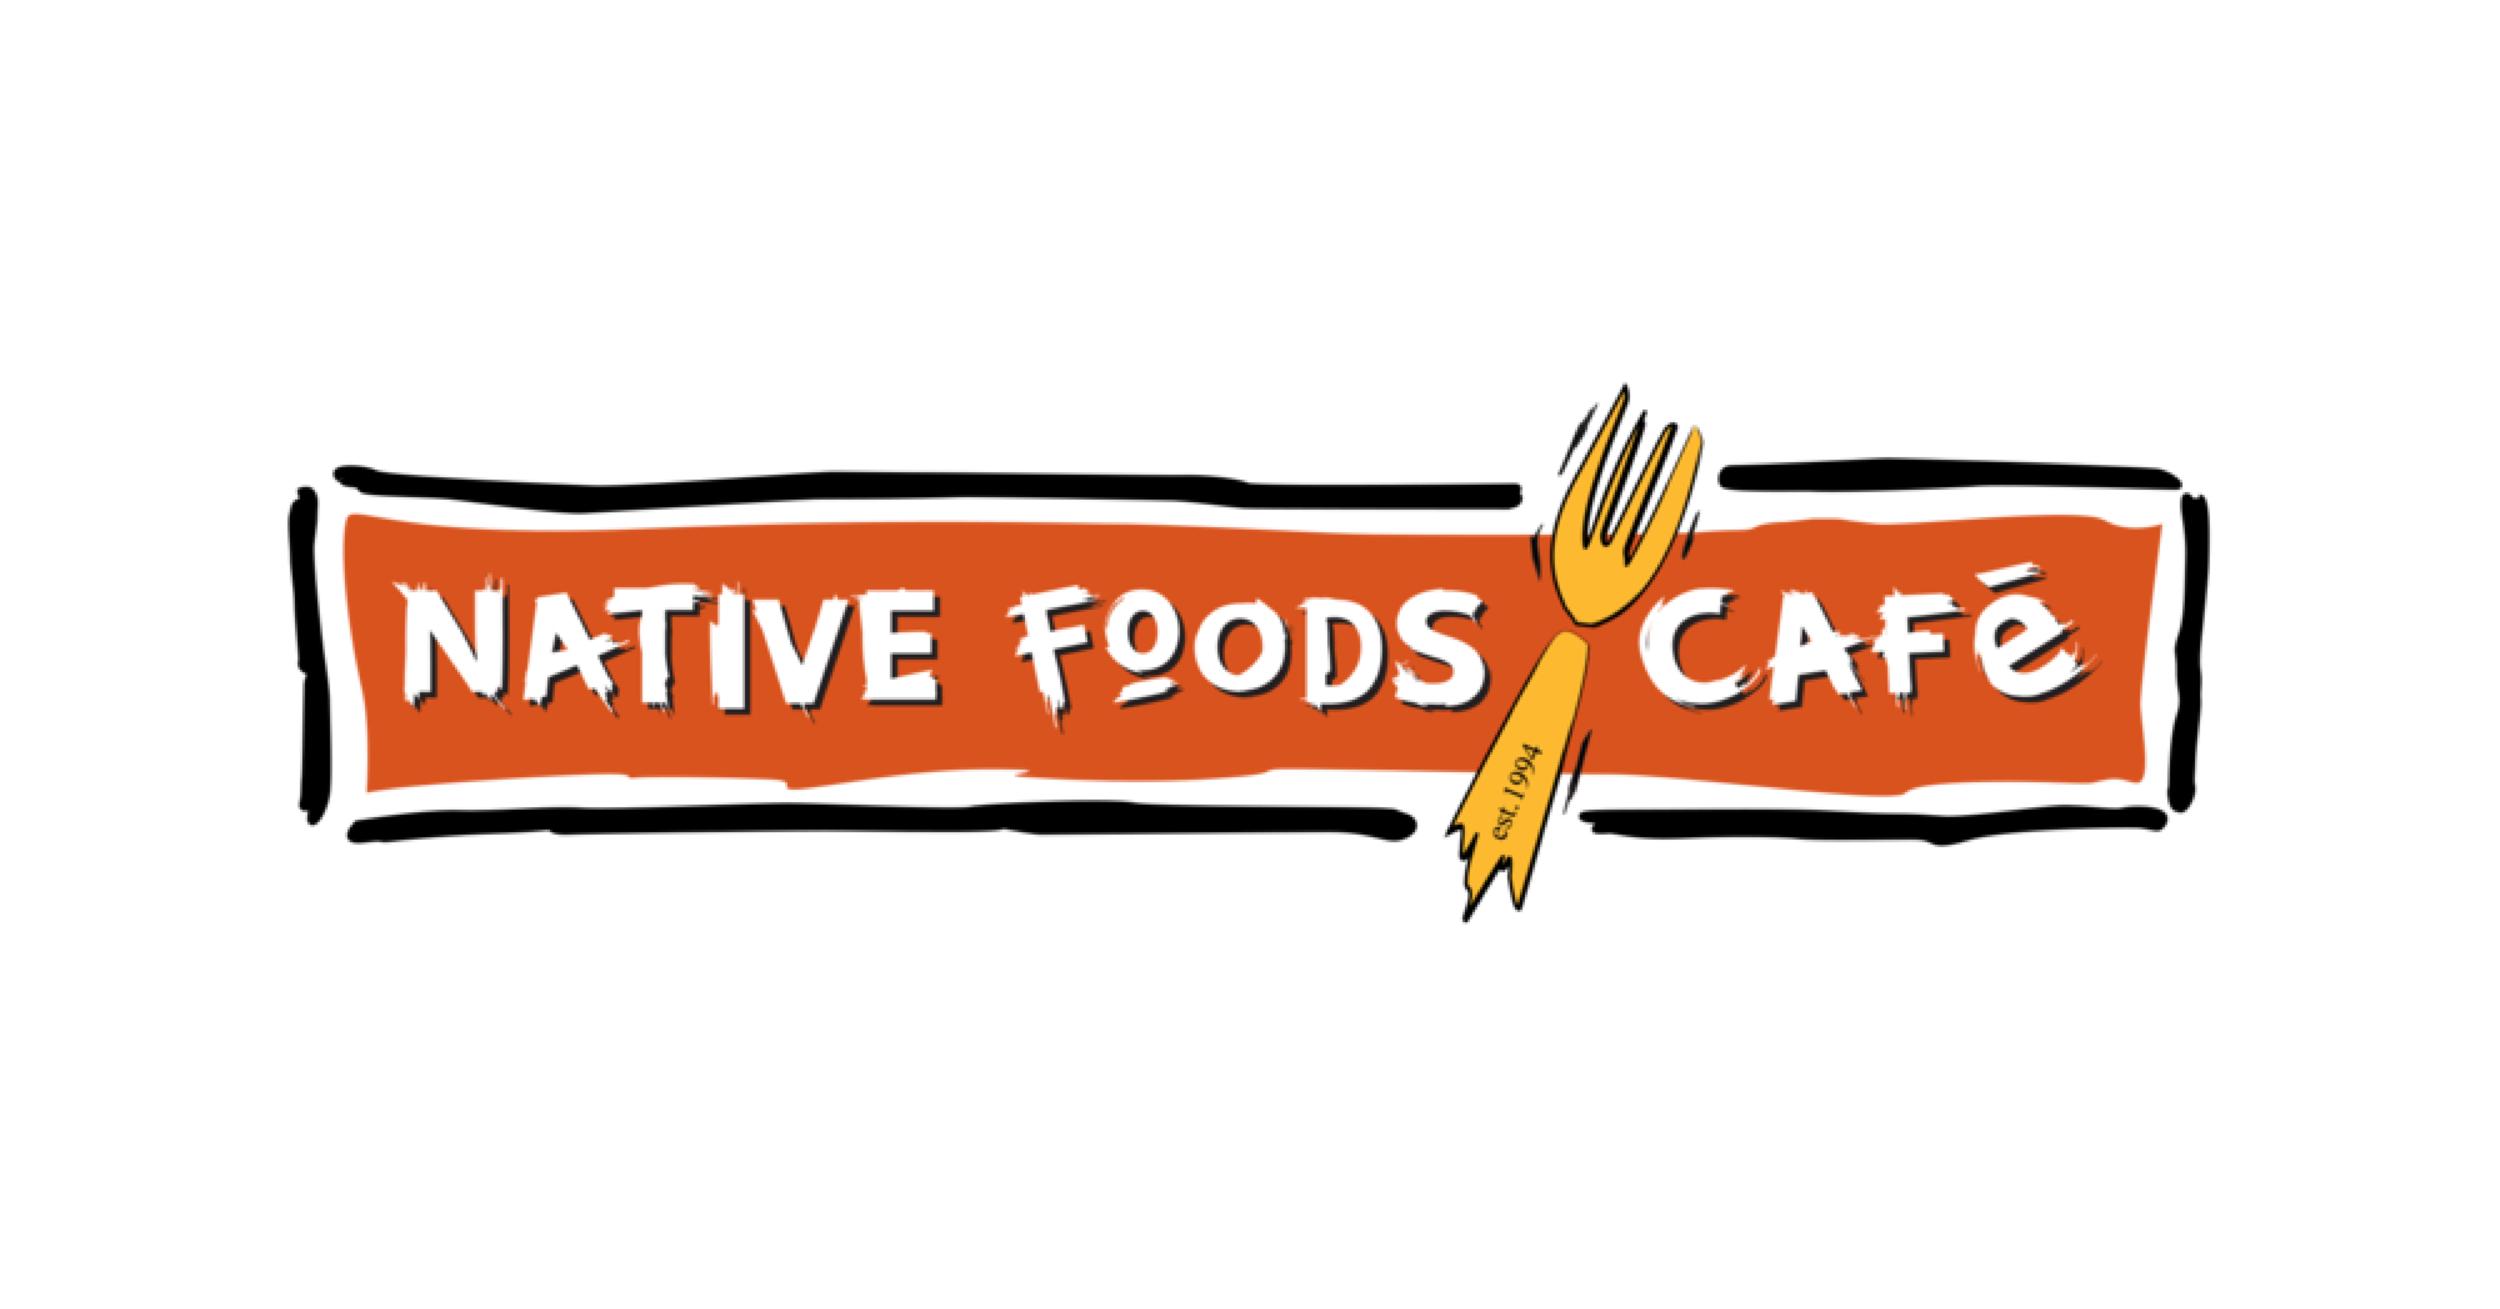 Plant-based tips for eating at Native Foods. Vegan menu options for Native Foods explained.